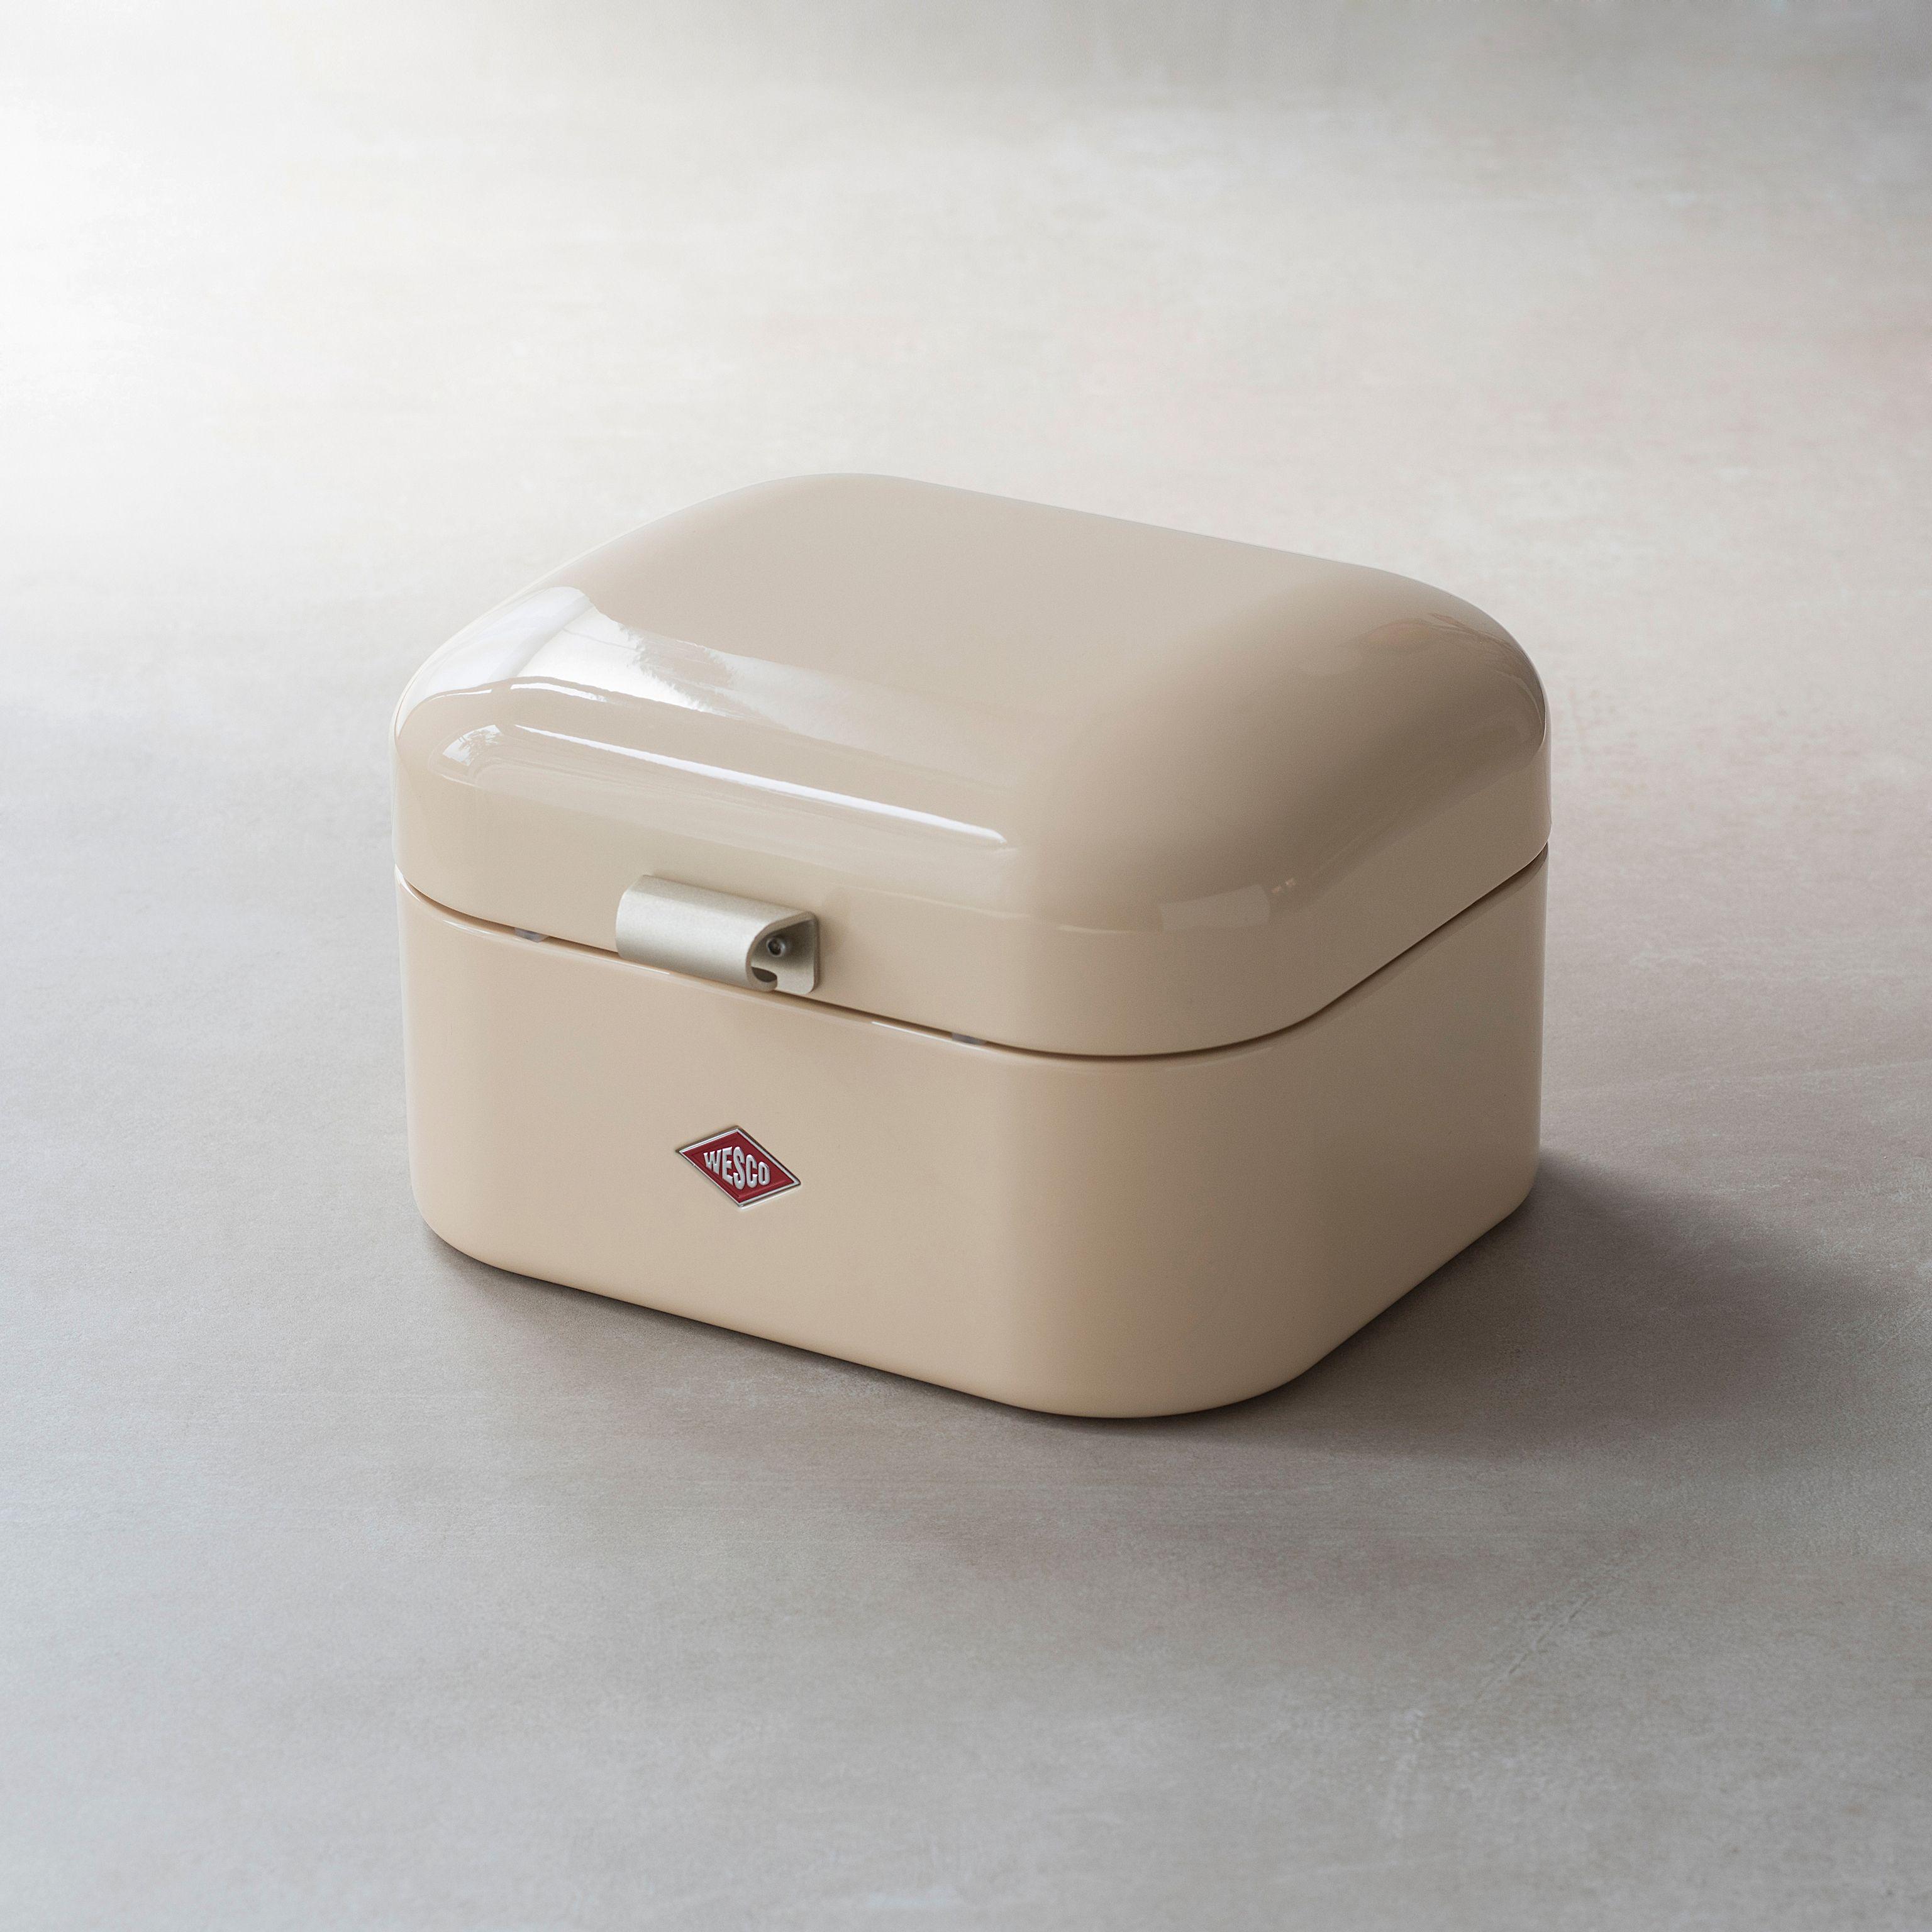 Wesco single grandy retro design brotkasten brotbox mandel